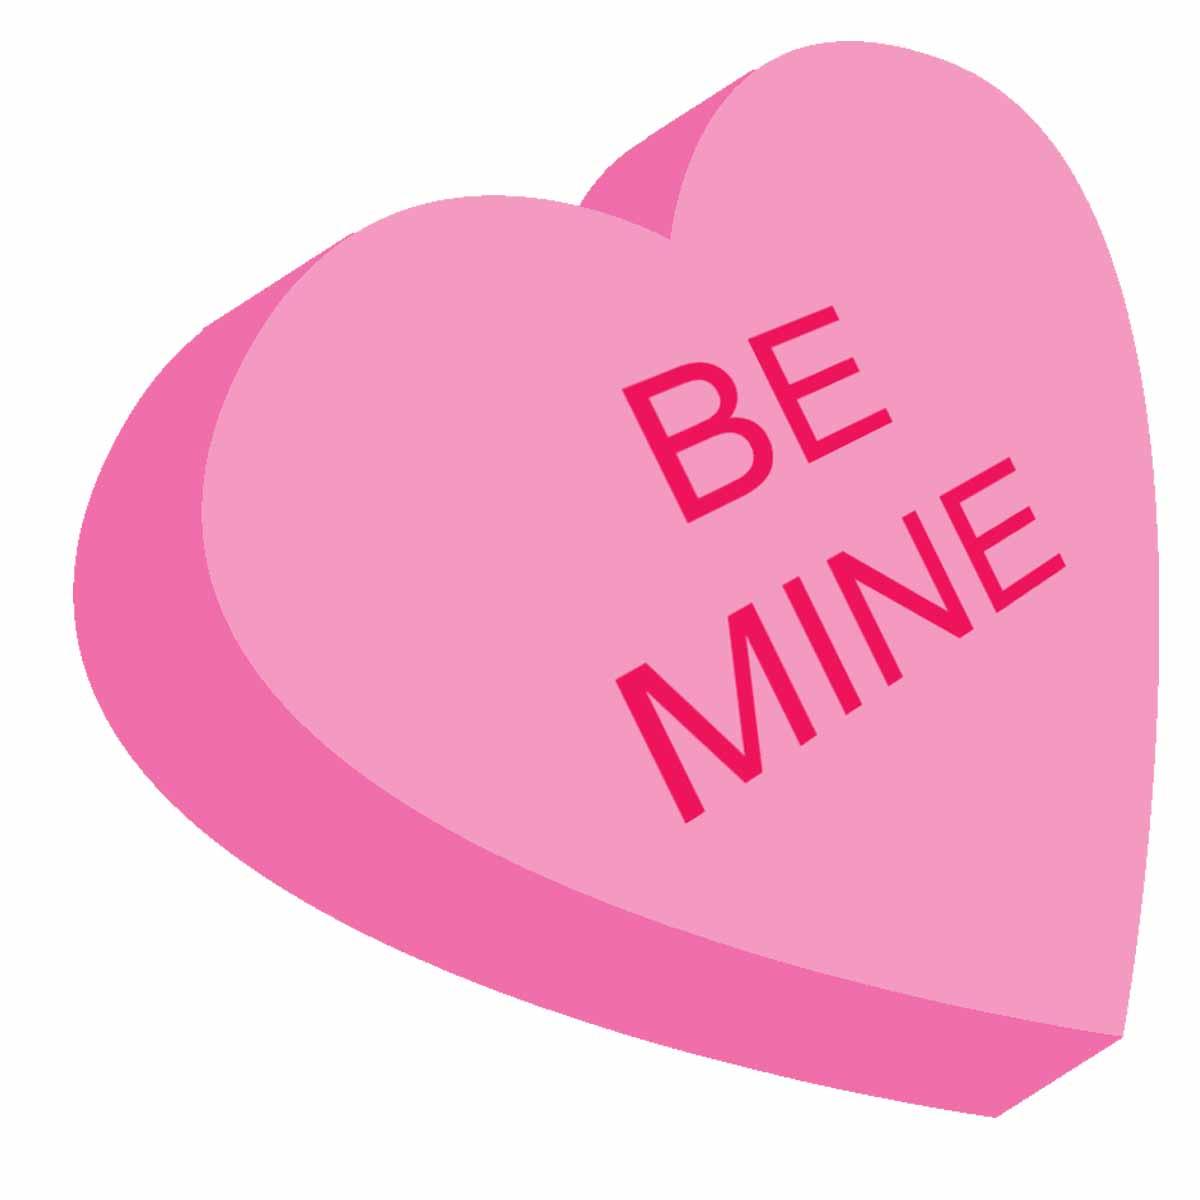 Valentine Clip Images Happy Valentines Clip 12516code.jpg